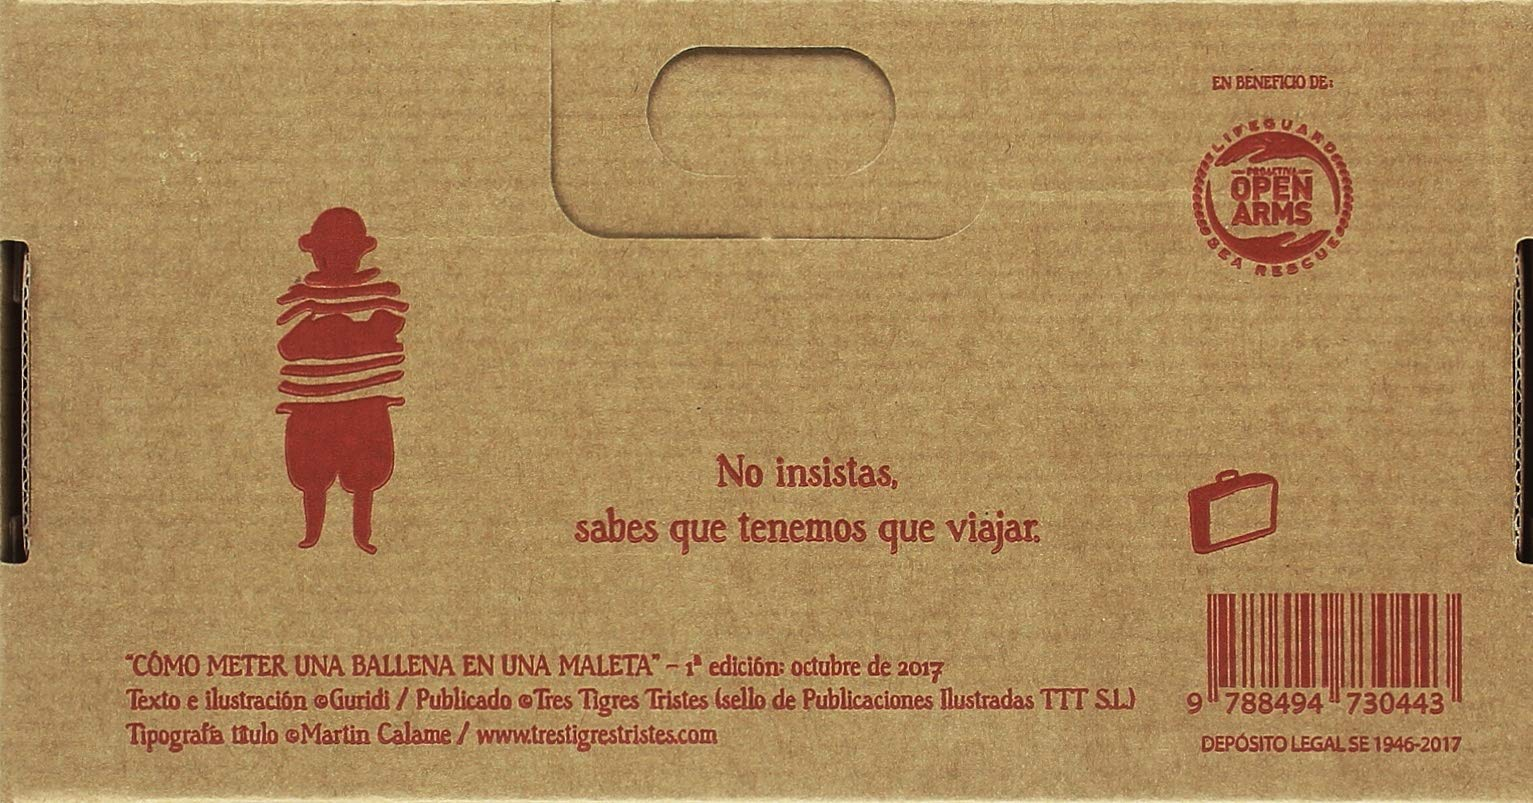 Cómo meter una ballena en una maleta: Raúl Nieto Guridi: 9788494730443: Amazon.com: Books